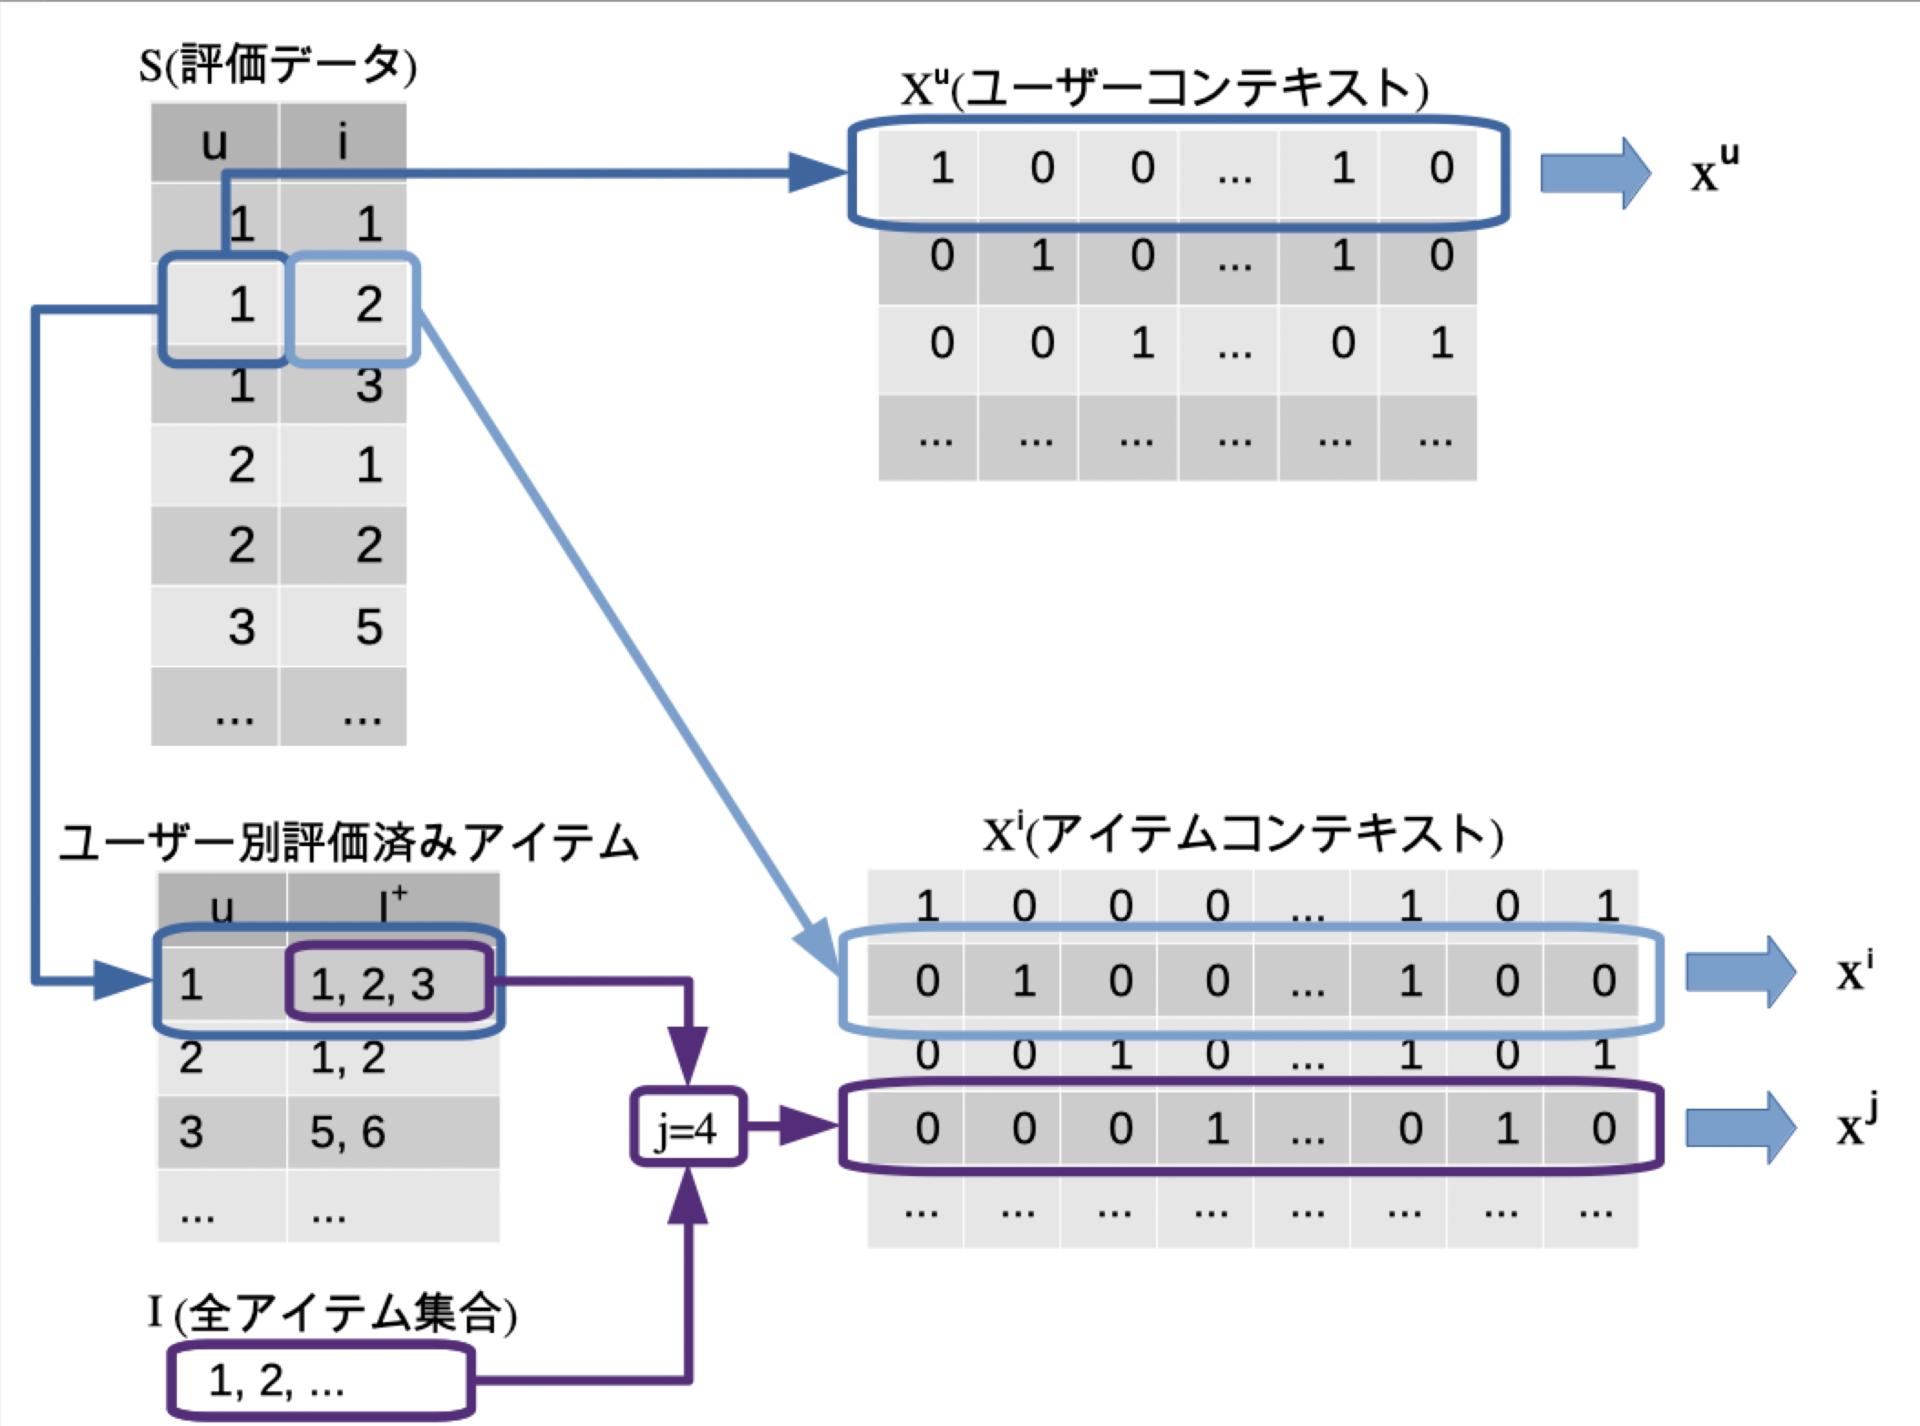 f:id:livesense-analytics:20200720101656p:plain